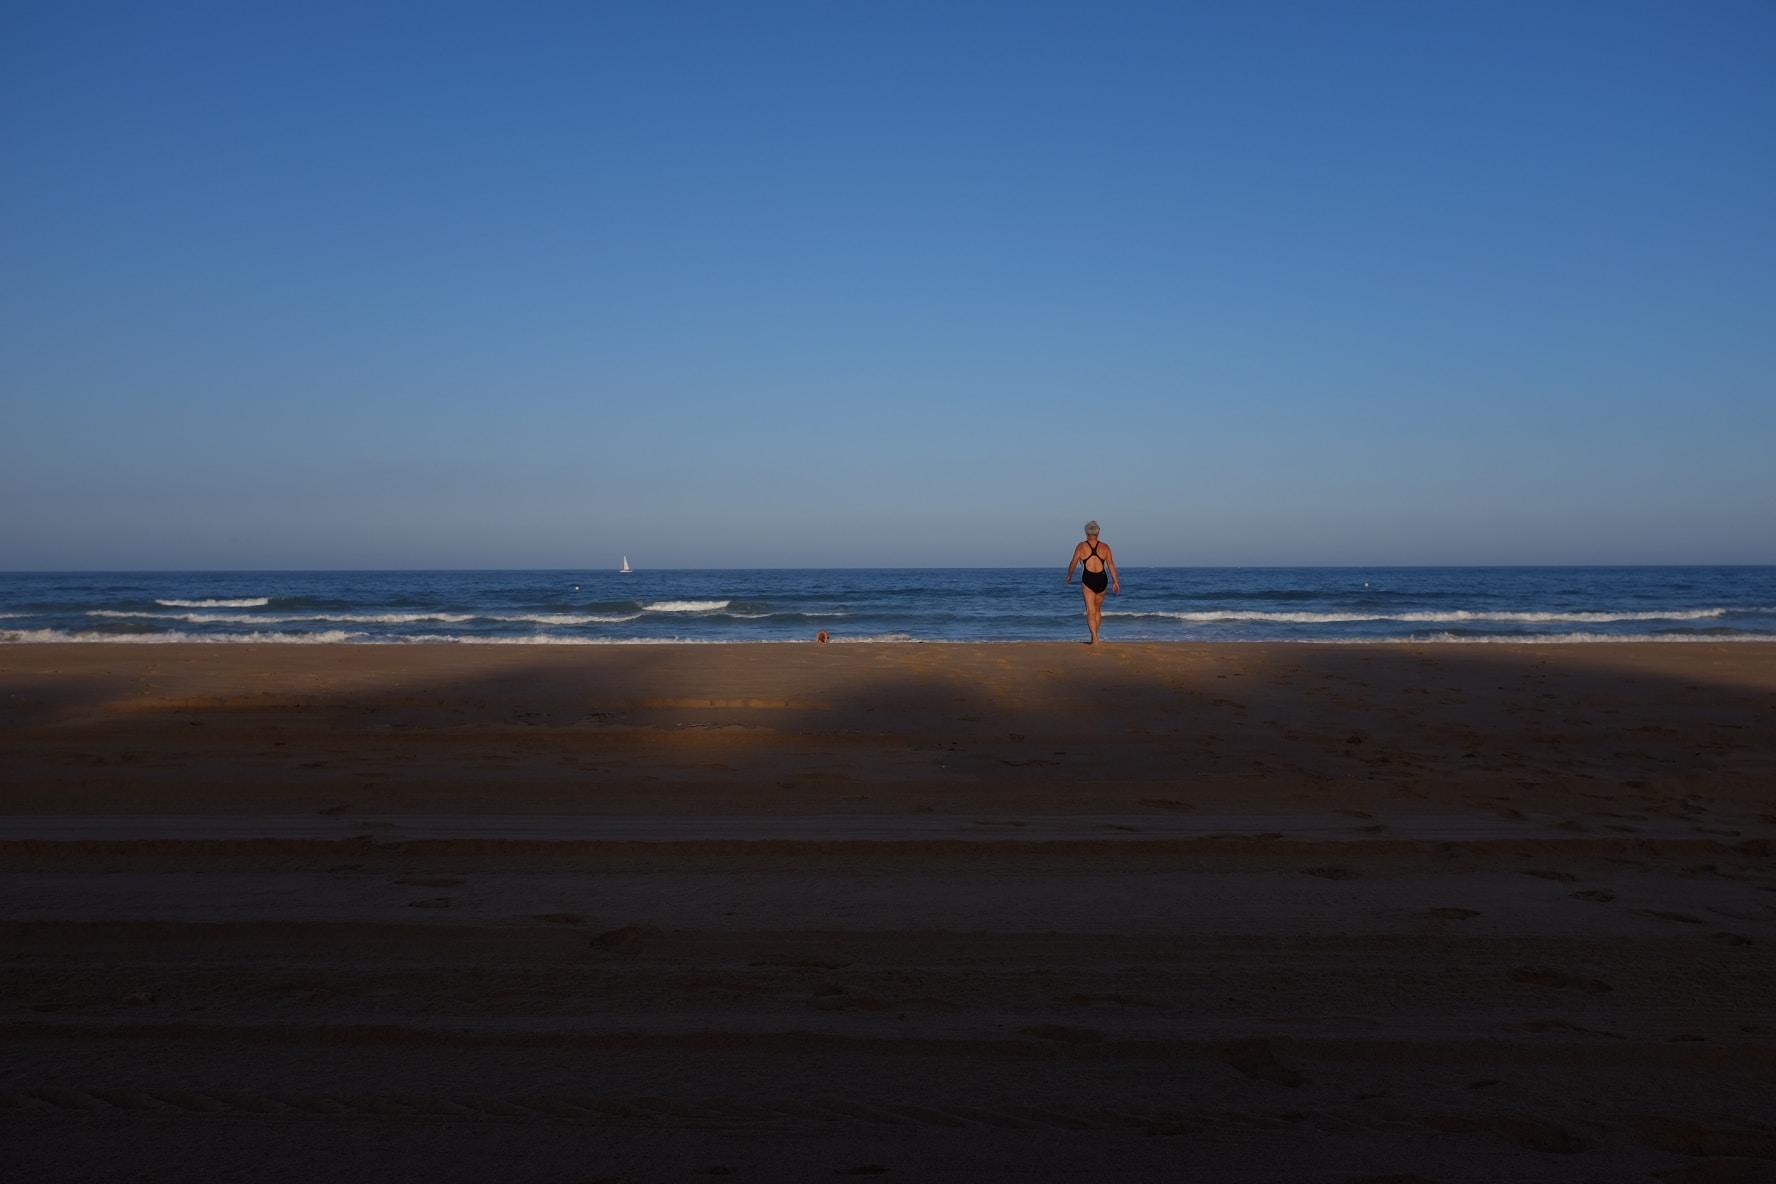 Woman in swimsuit walking on the sandy beach towards the ocean